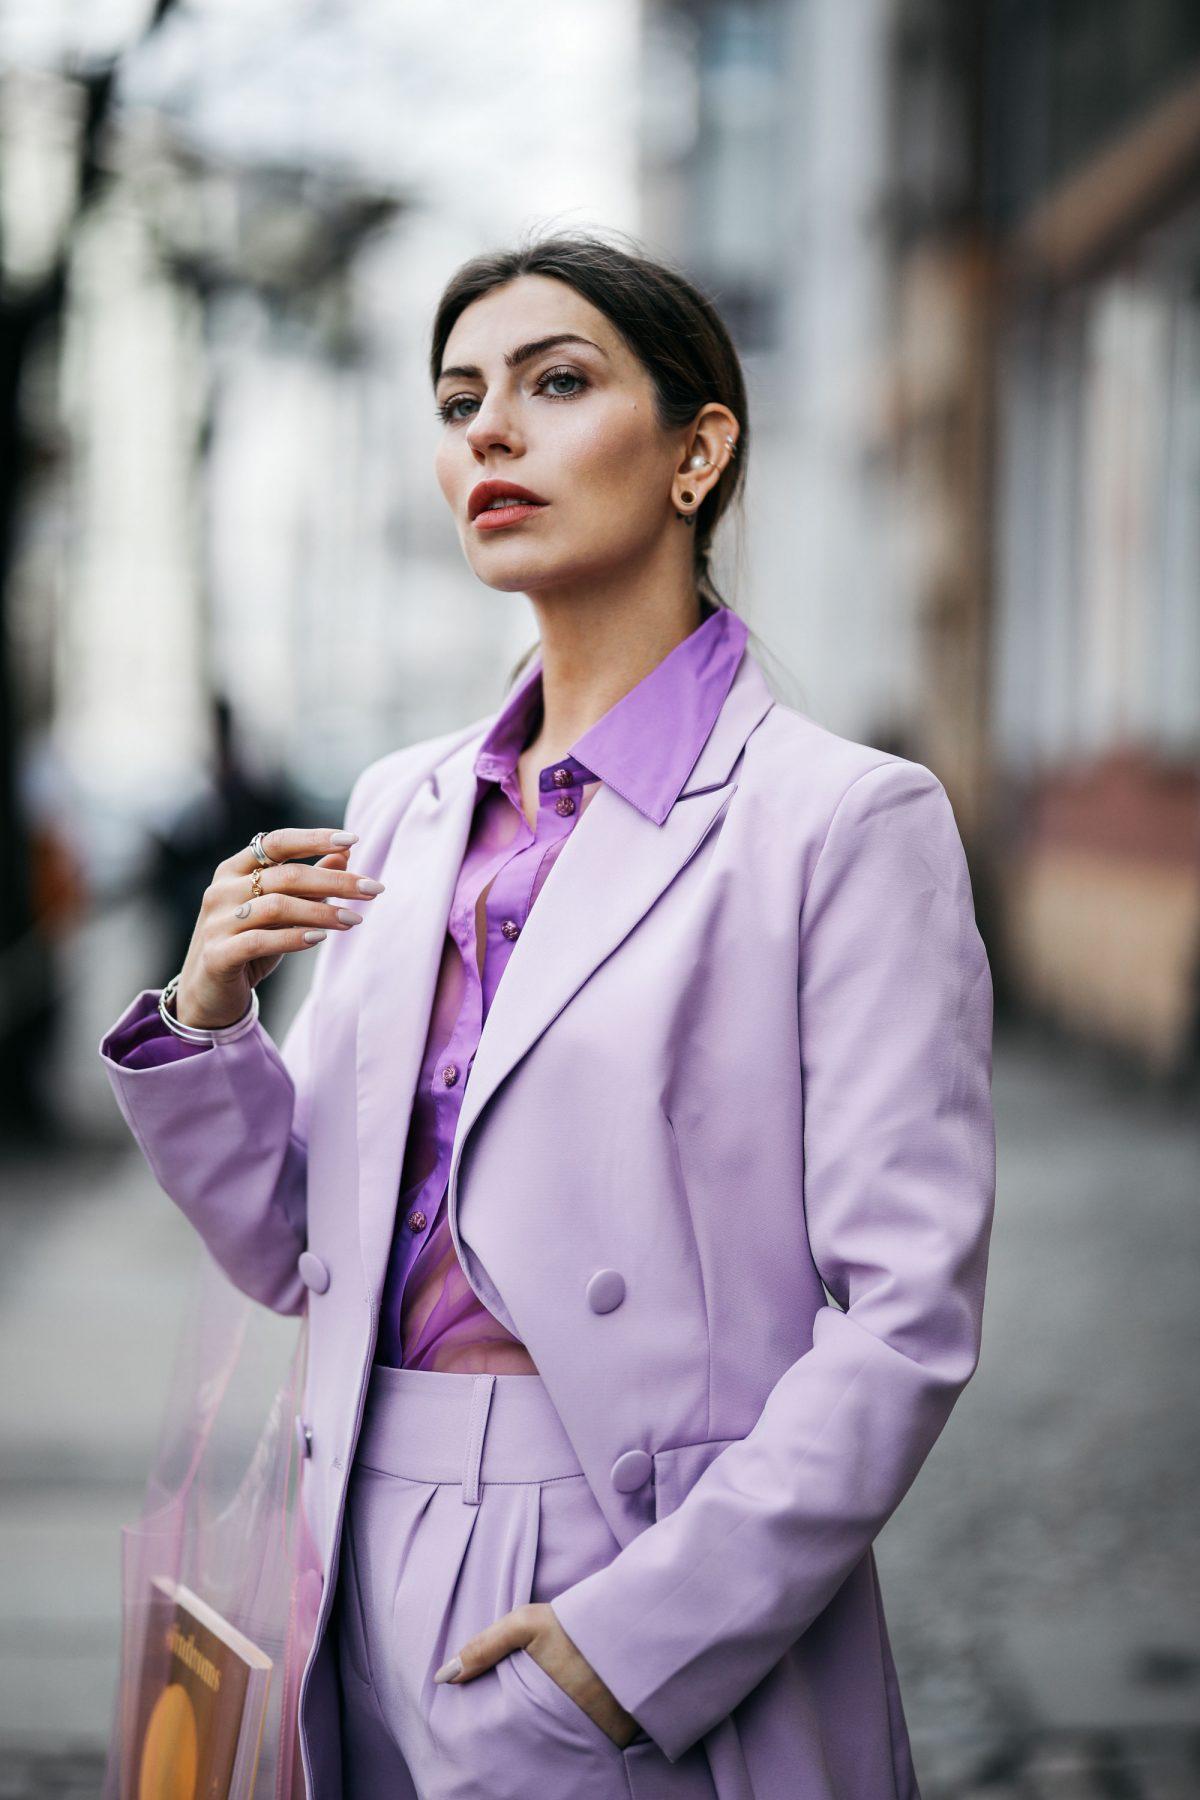 The Purple Suit